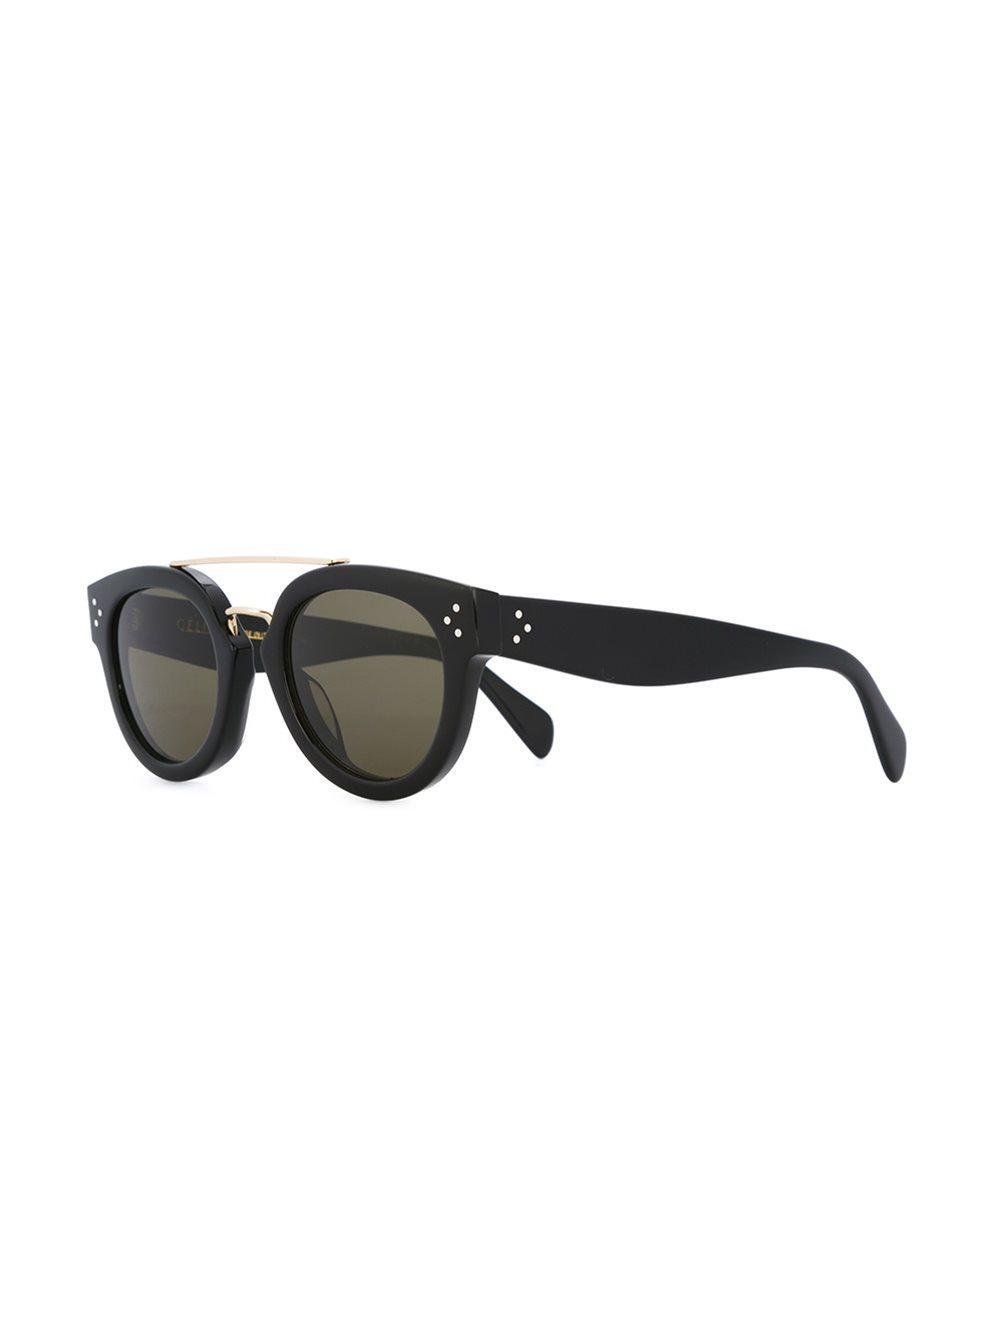 Celine Round Frame Sunglasses in Black